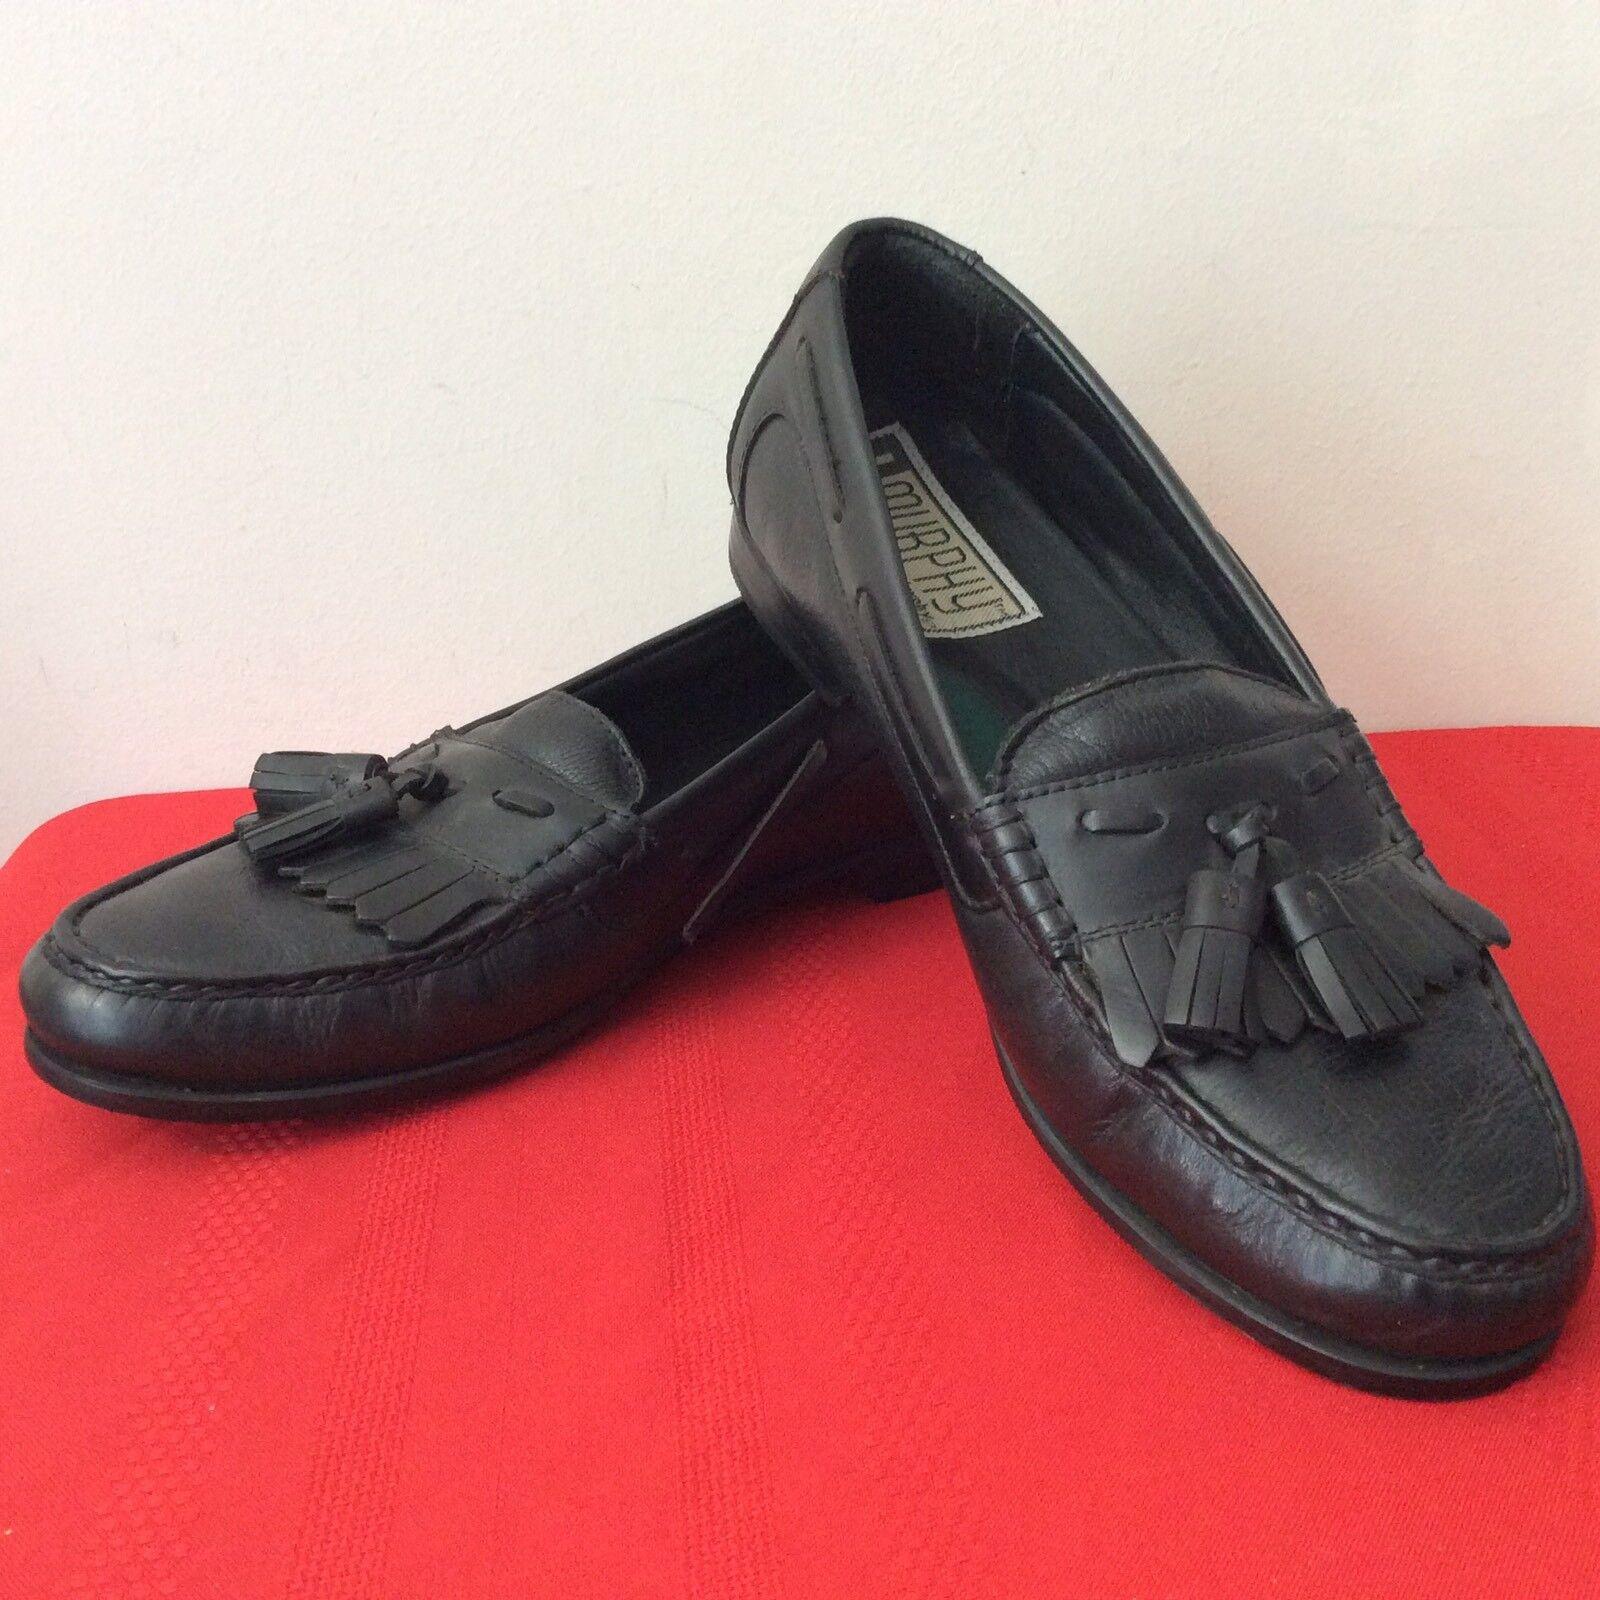 Johnston & Murphy Slip Black Leather Tassle Loafers Slip Murphy On Shoes Mens Size 9M. (Bx1) 6f6ac4